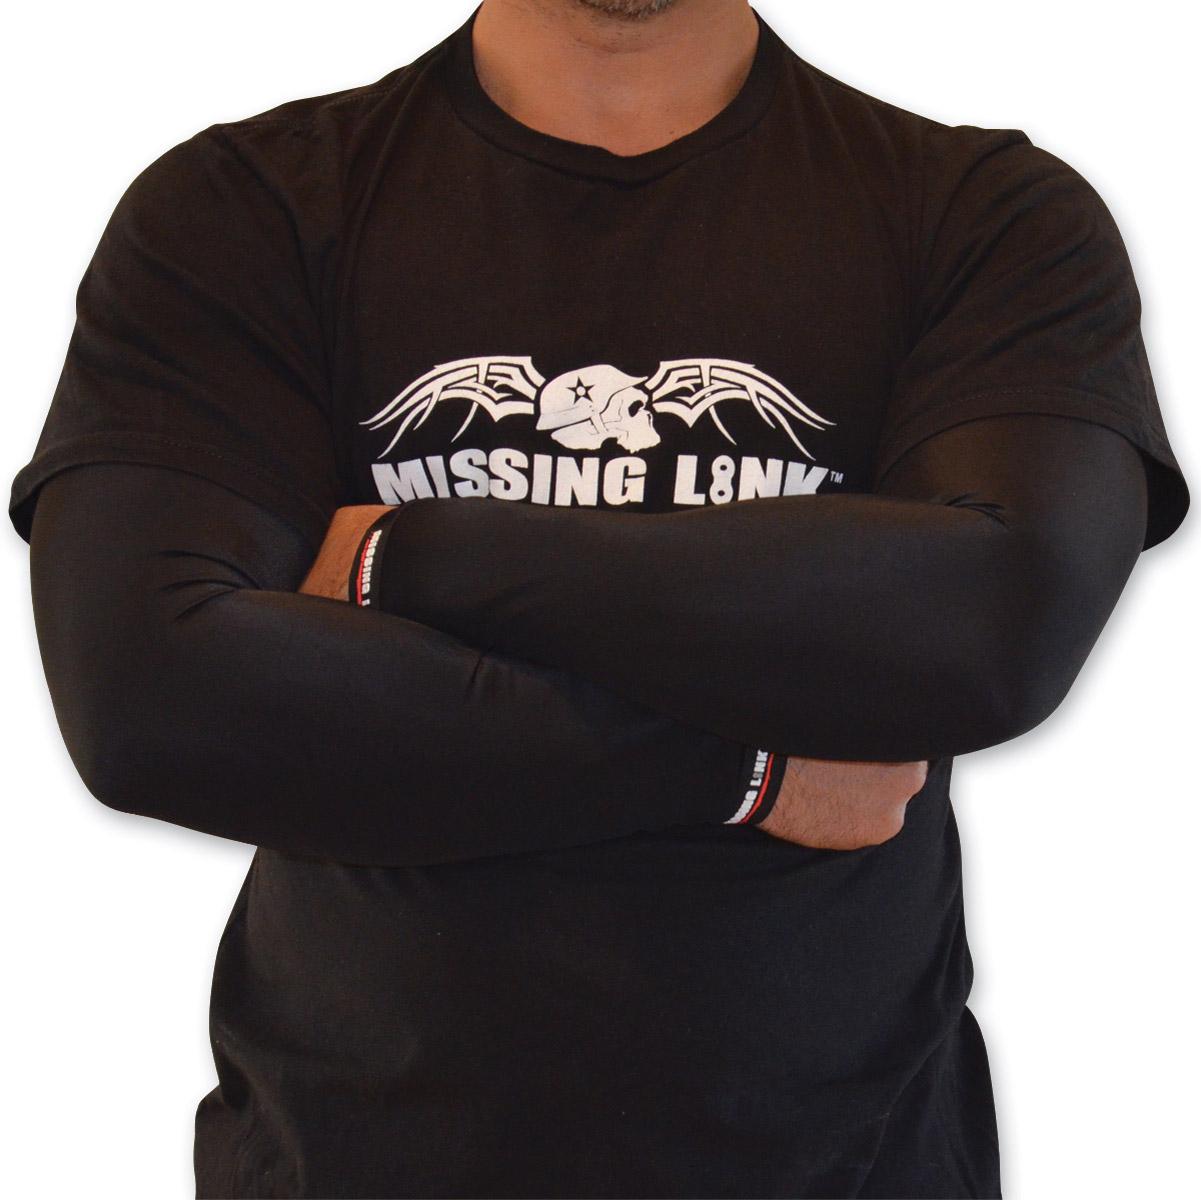 Missing Link Solid Black ArmPro Sleeves